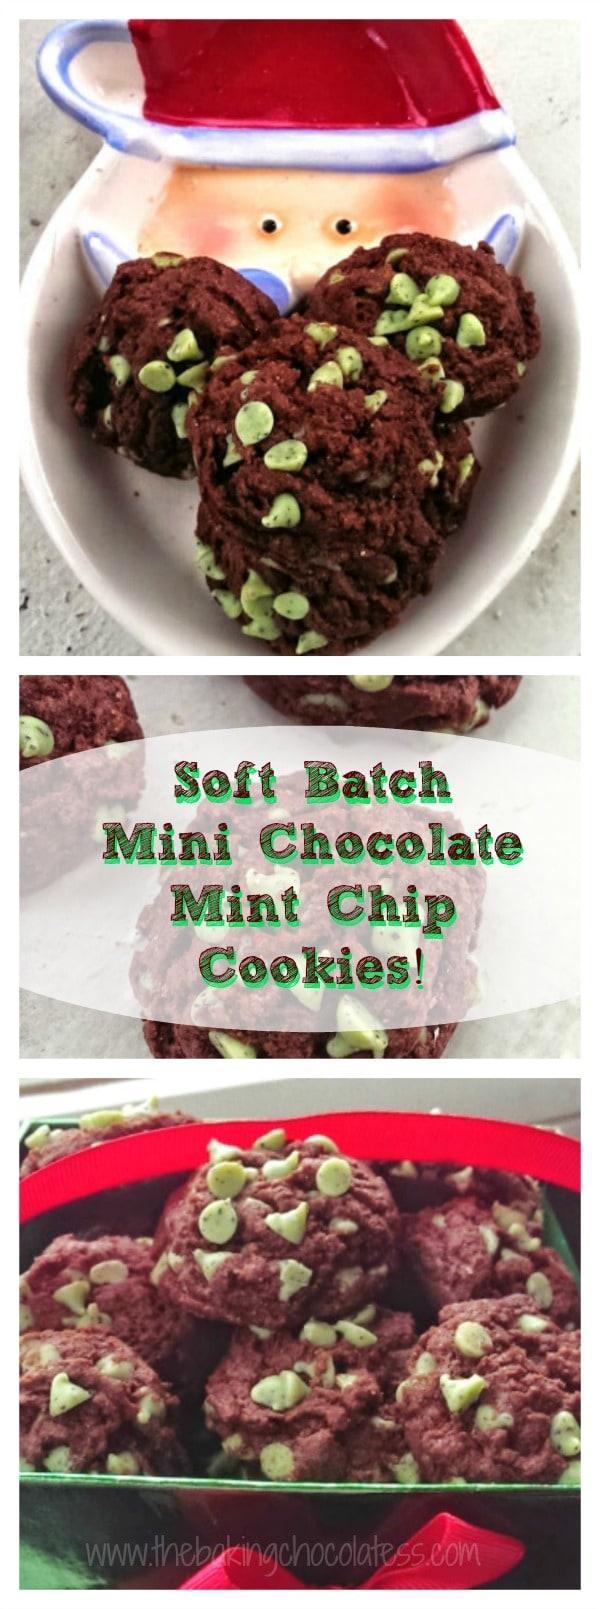 Soft Batch Mini Chocolate Mint Chip Cookies! {Fudgy too!}